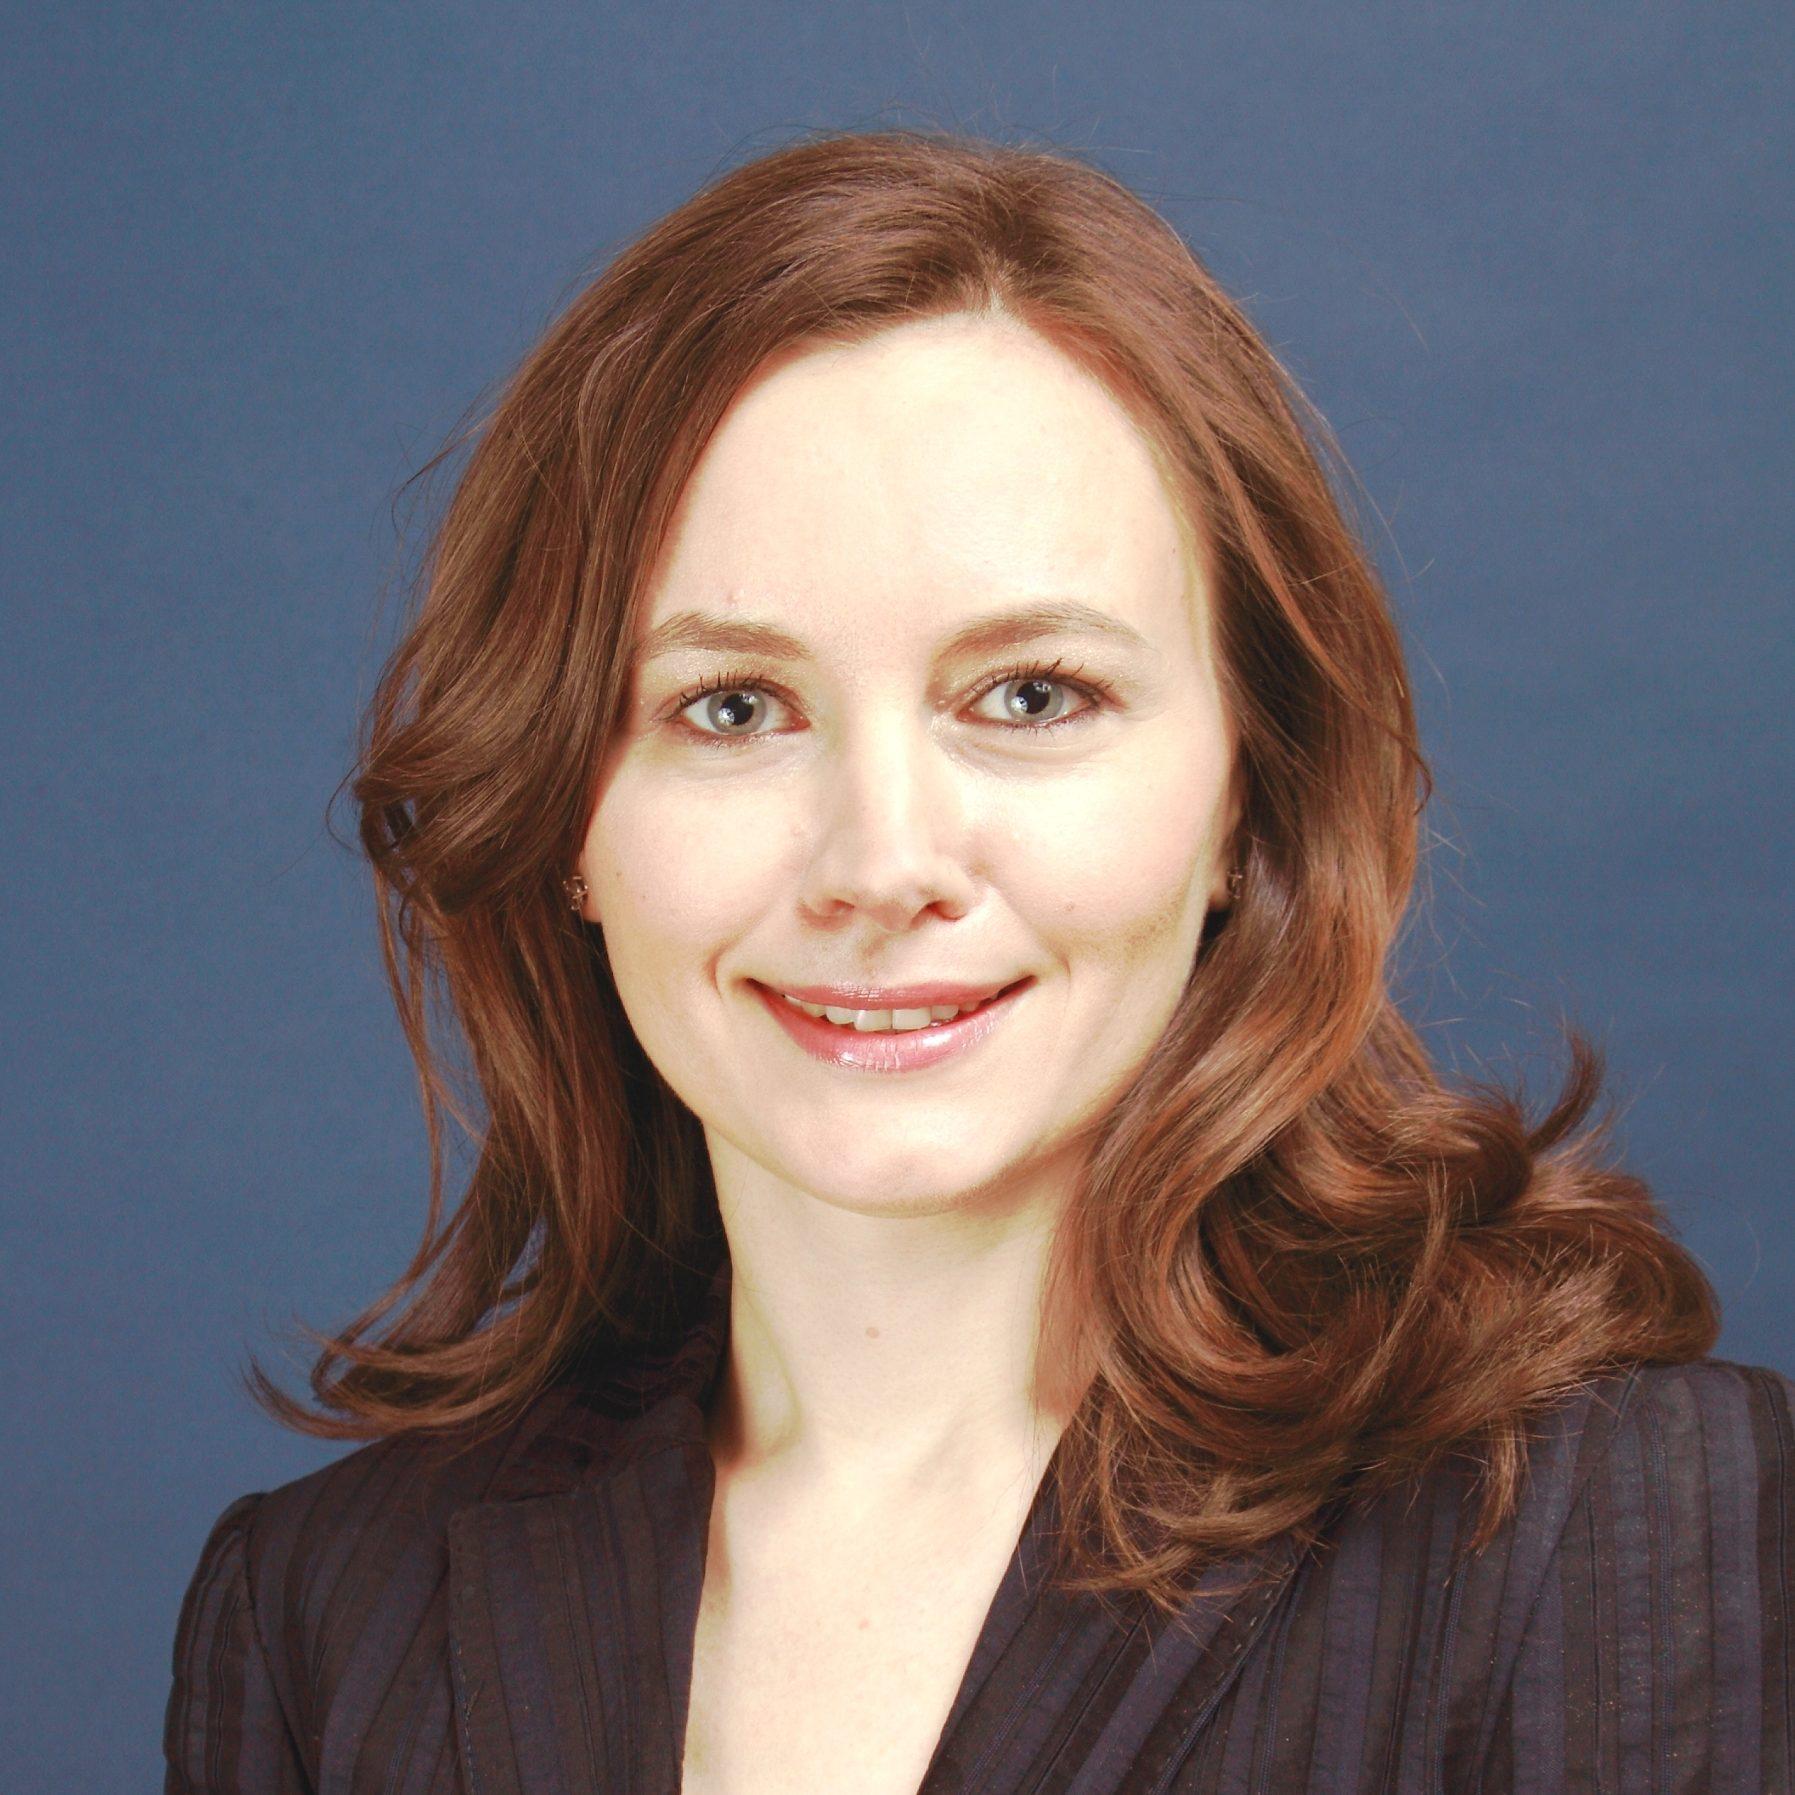 Louiza Ferrara, CFA - Portfolio Manager, U.S. EquitiesFOURPOINTS Asset Management (New York)